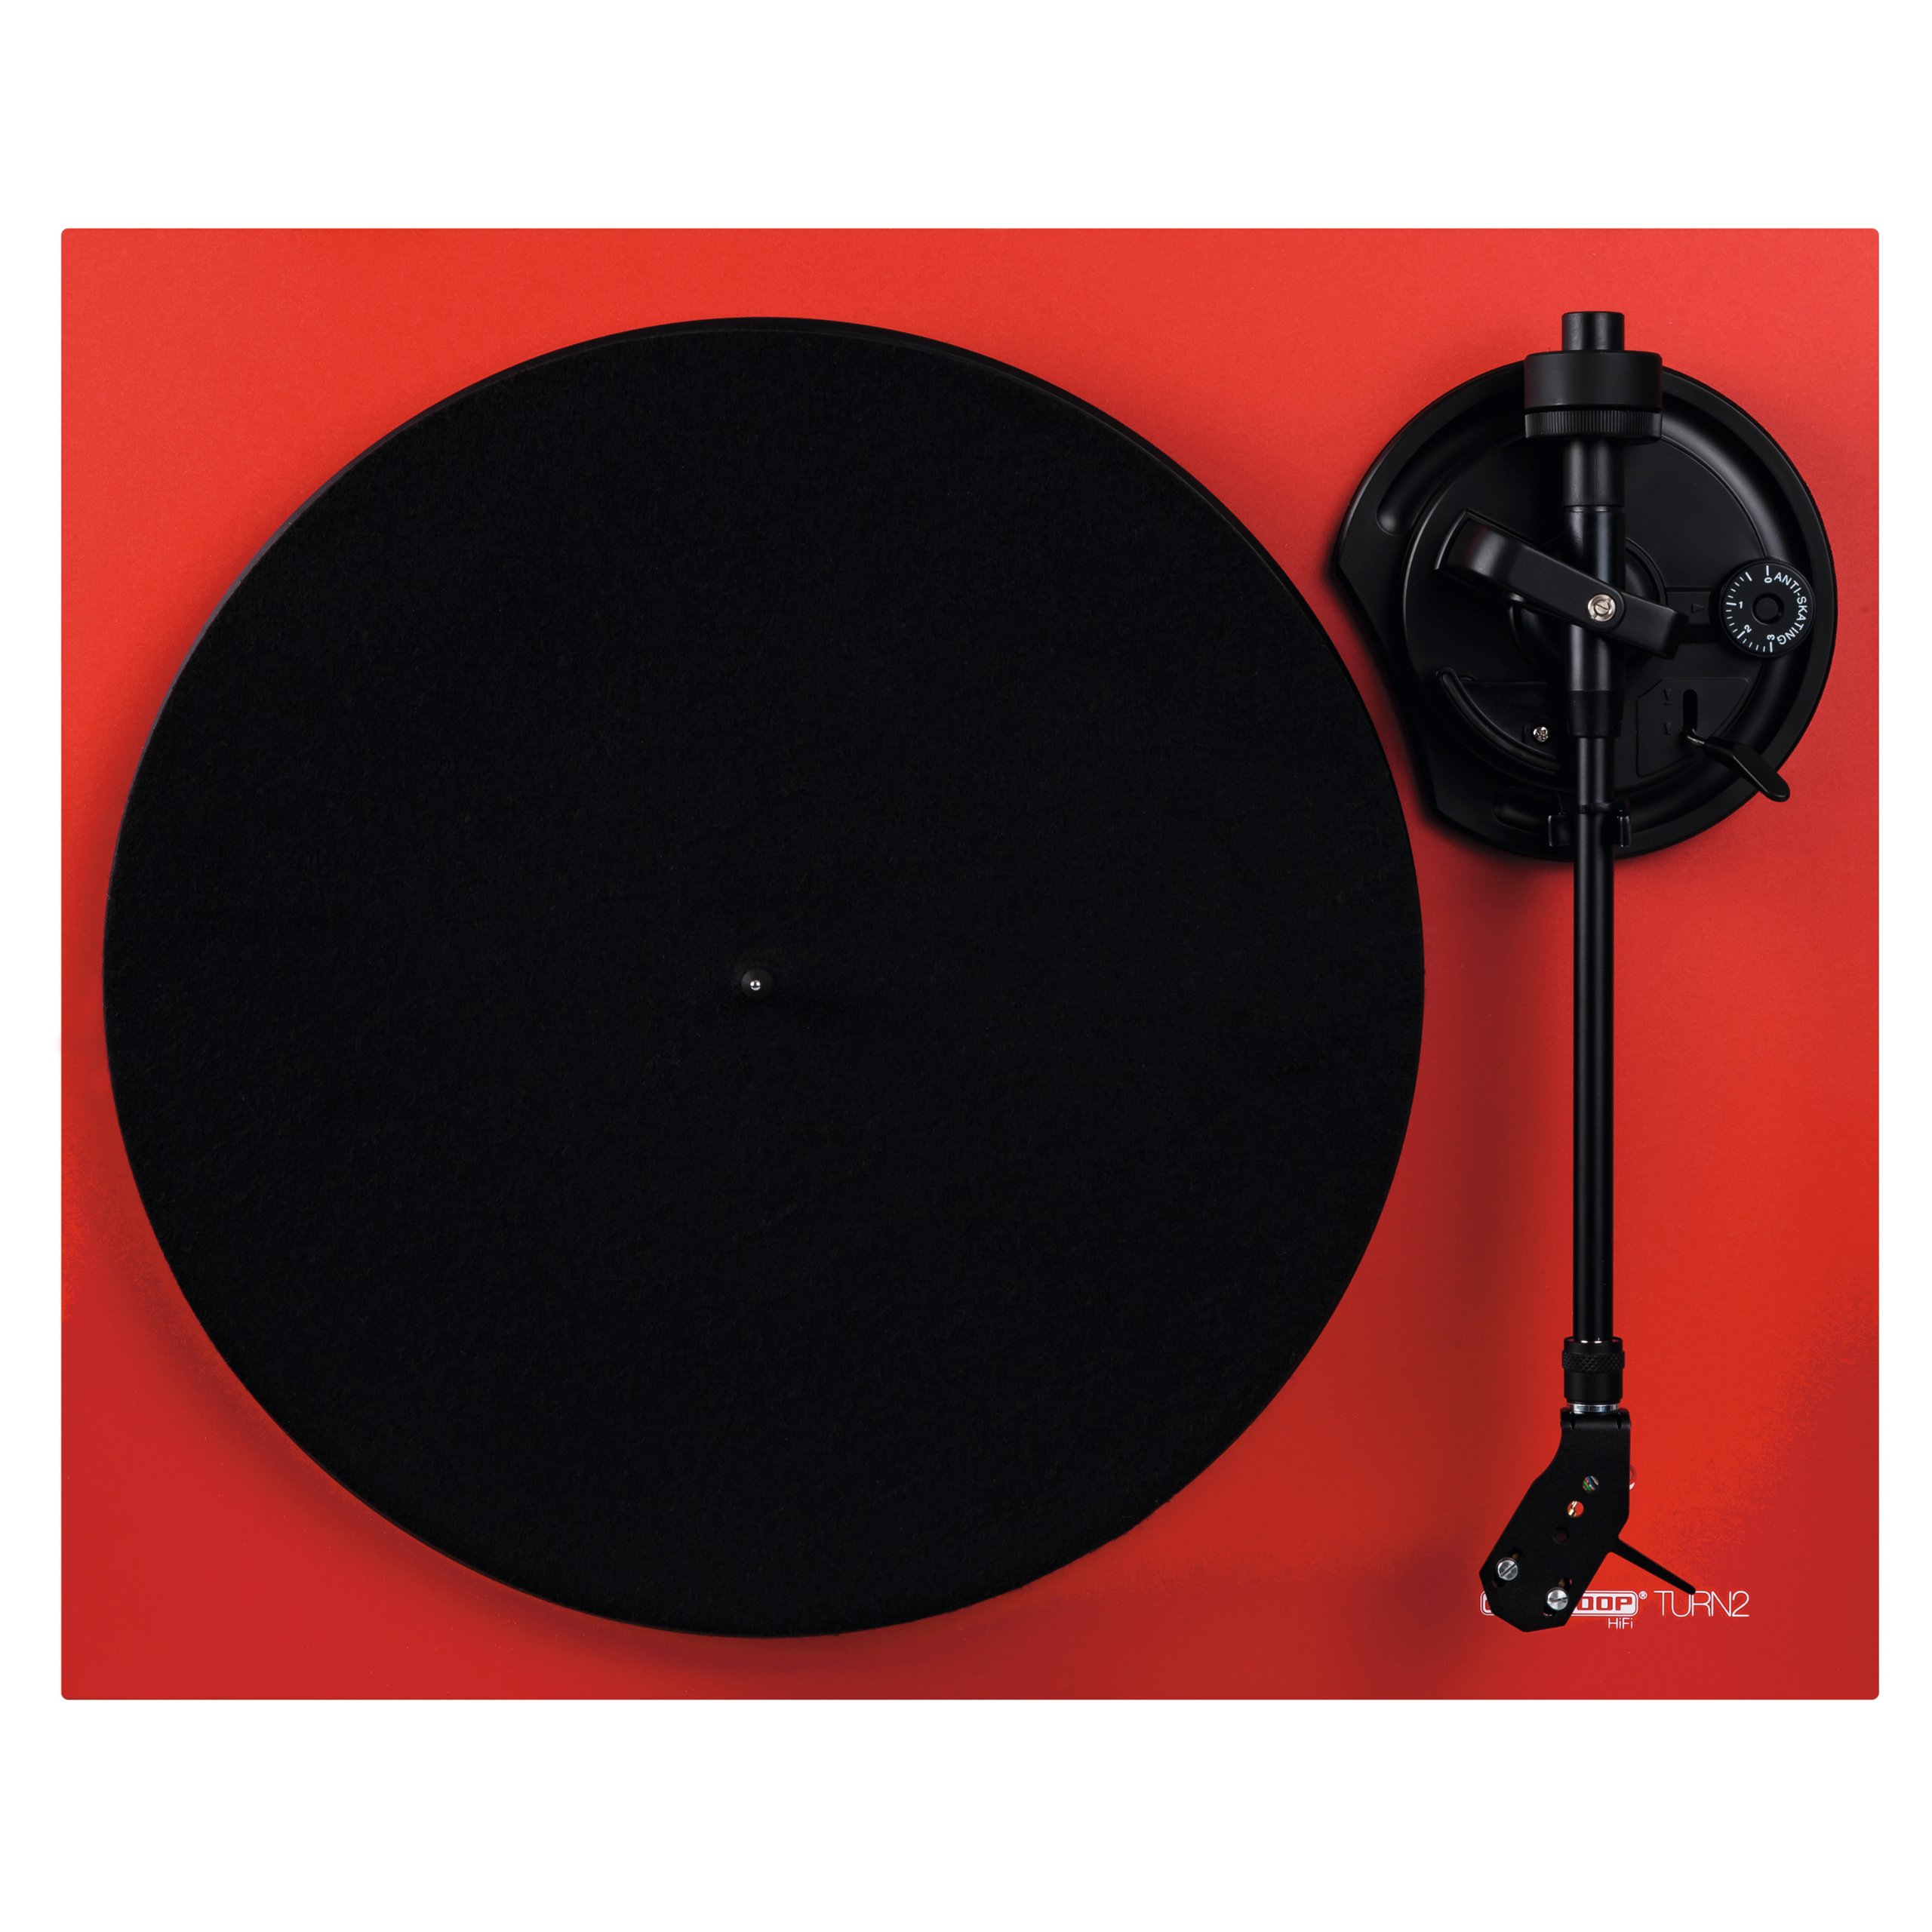 Item Reloop TURN 2 RED Turntable + Ortofon M10 insert